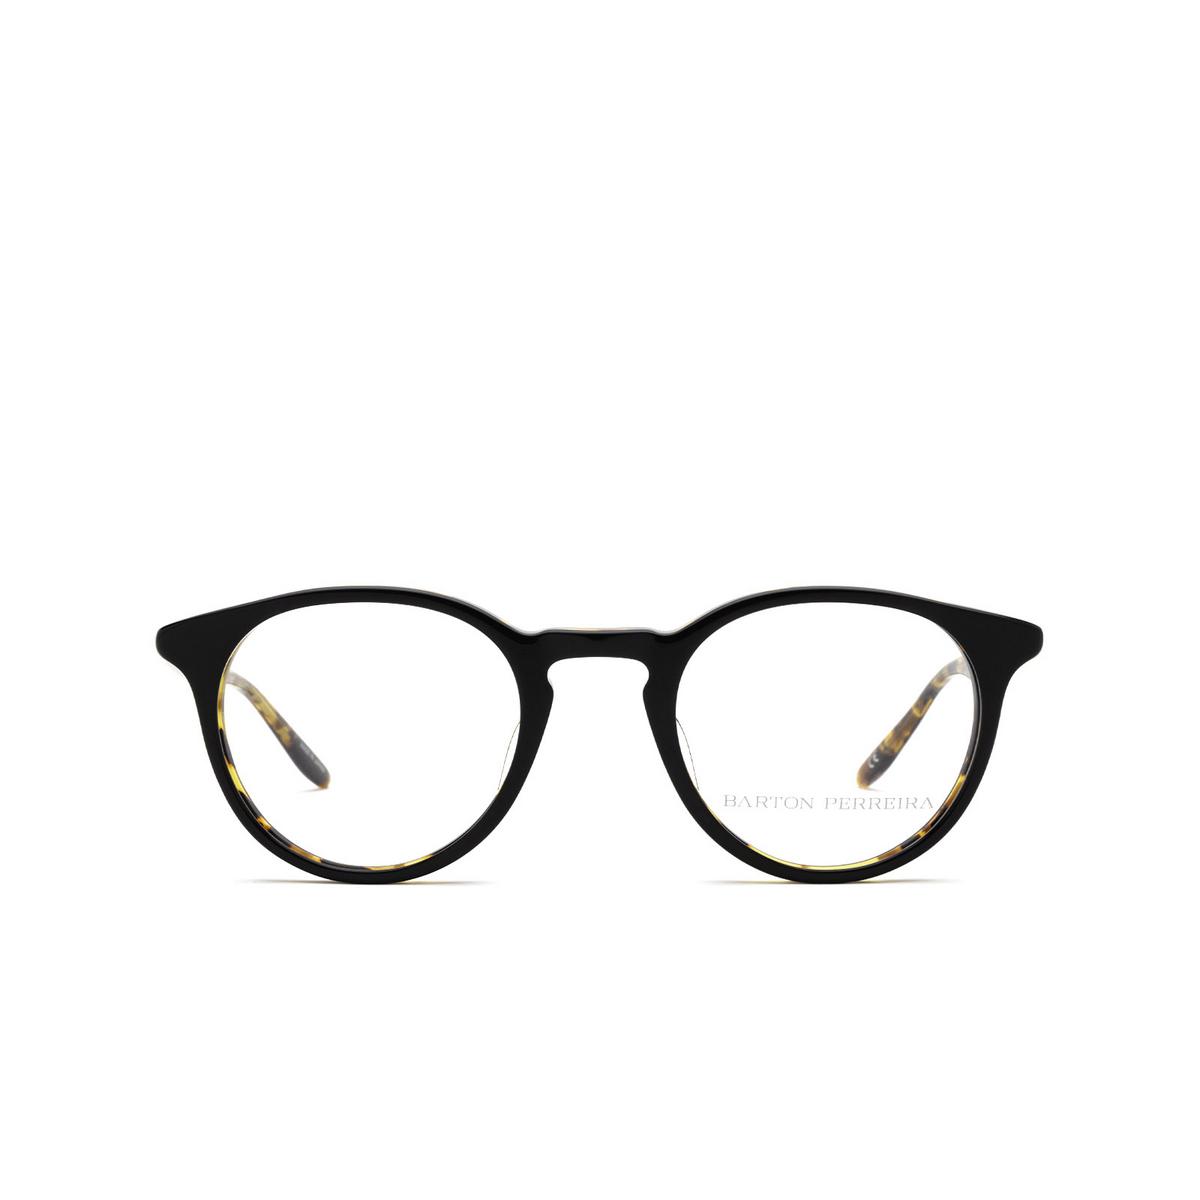 Barton Perreira® Round Eyeglasses: Princeton BP5045 color Black Amber Tortoise 0CK - front view.